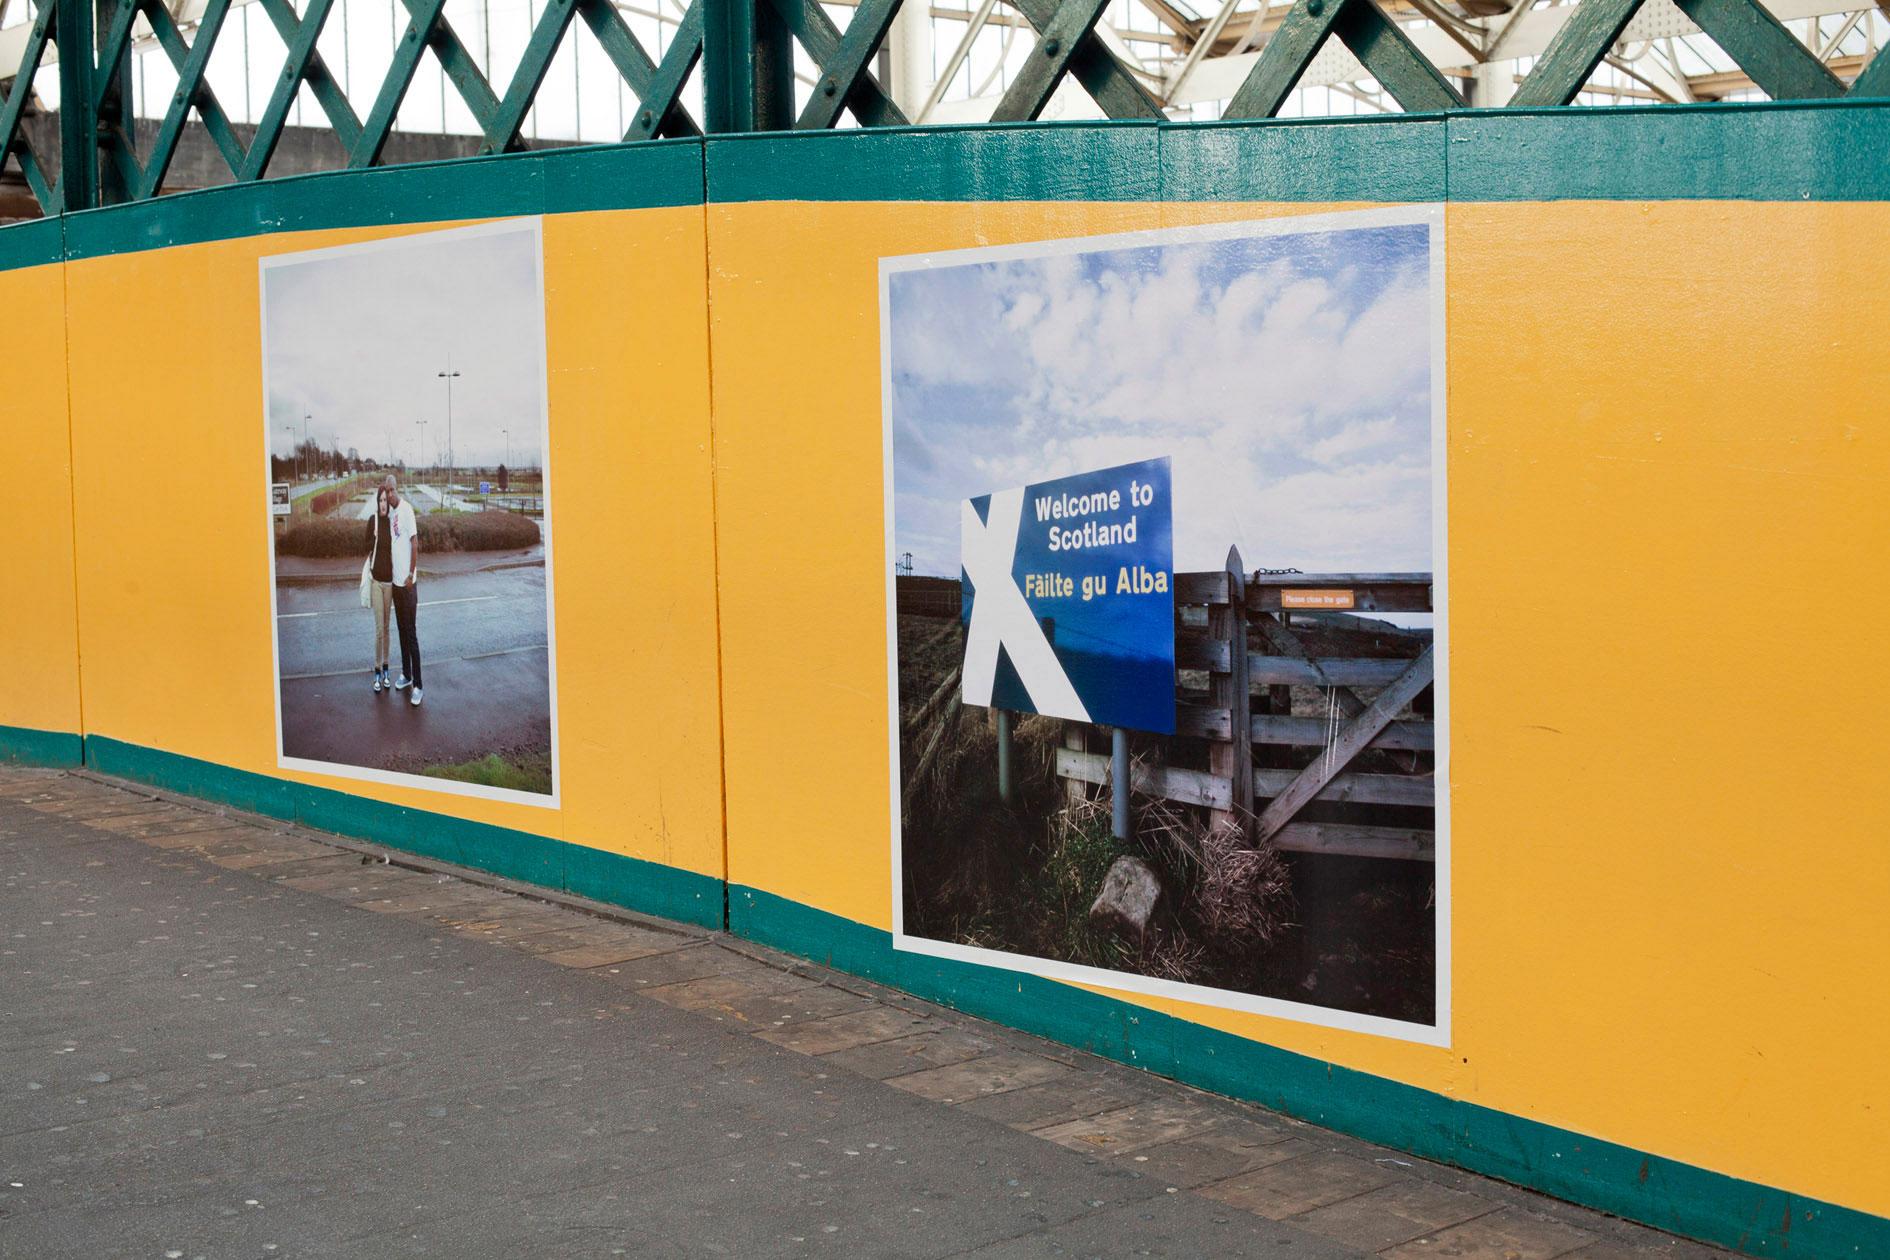 Carlisle Photo Festival Colin McPherson's images from 'A Fine Line' installed at Carlisle Photo Festival © Streetlevel Photoworks November 2014© Streetlevel Photoworks November 2014